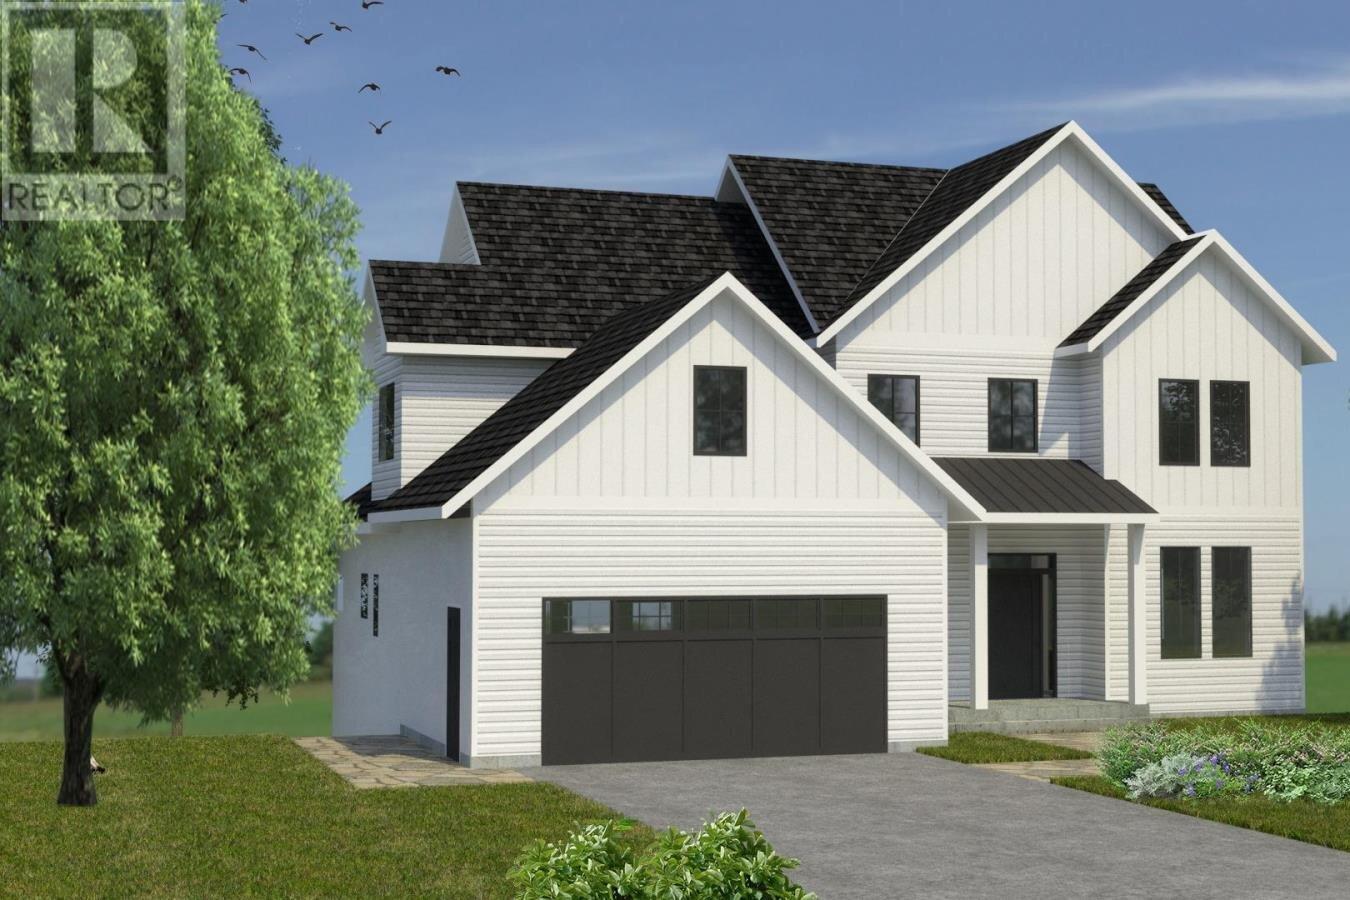 House for sale at 656 156 Azure Ct Unit LOT Middle Sackville Nova Scotia - MLS: 202003768